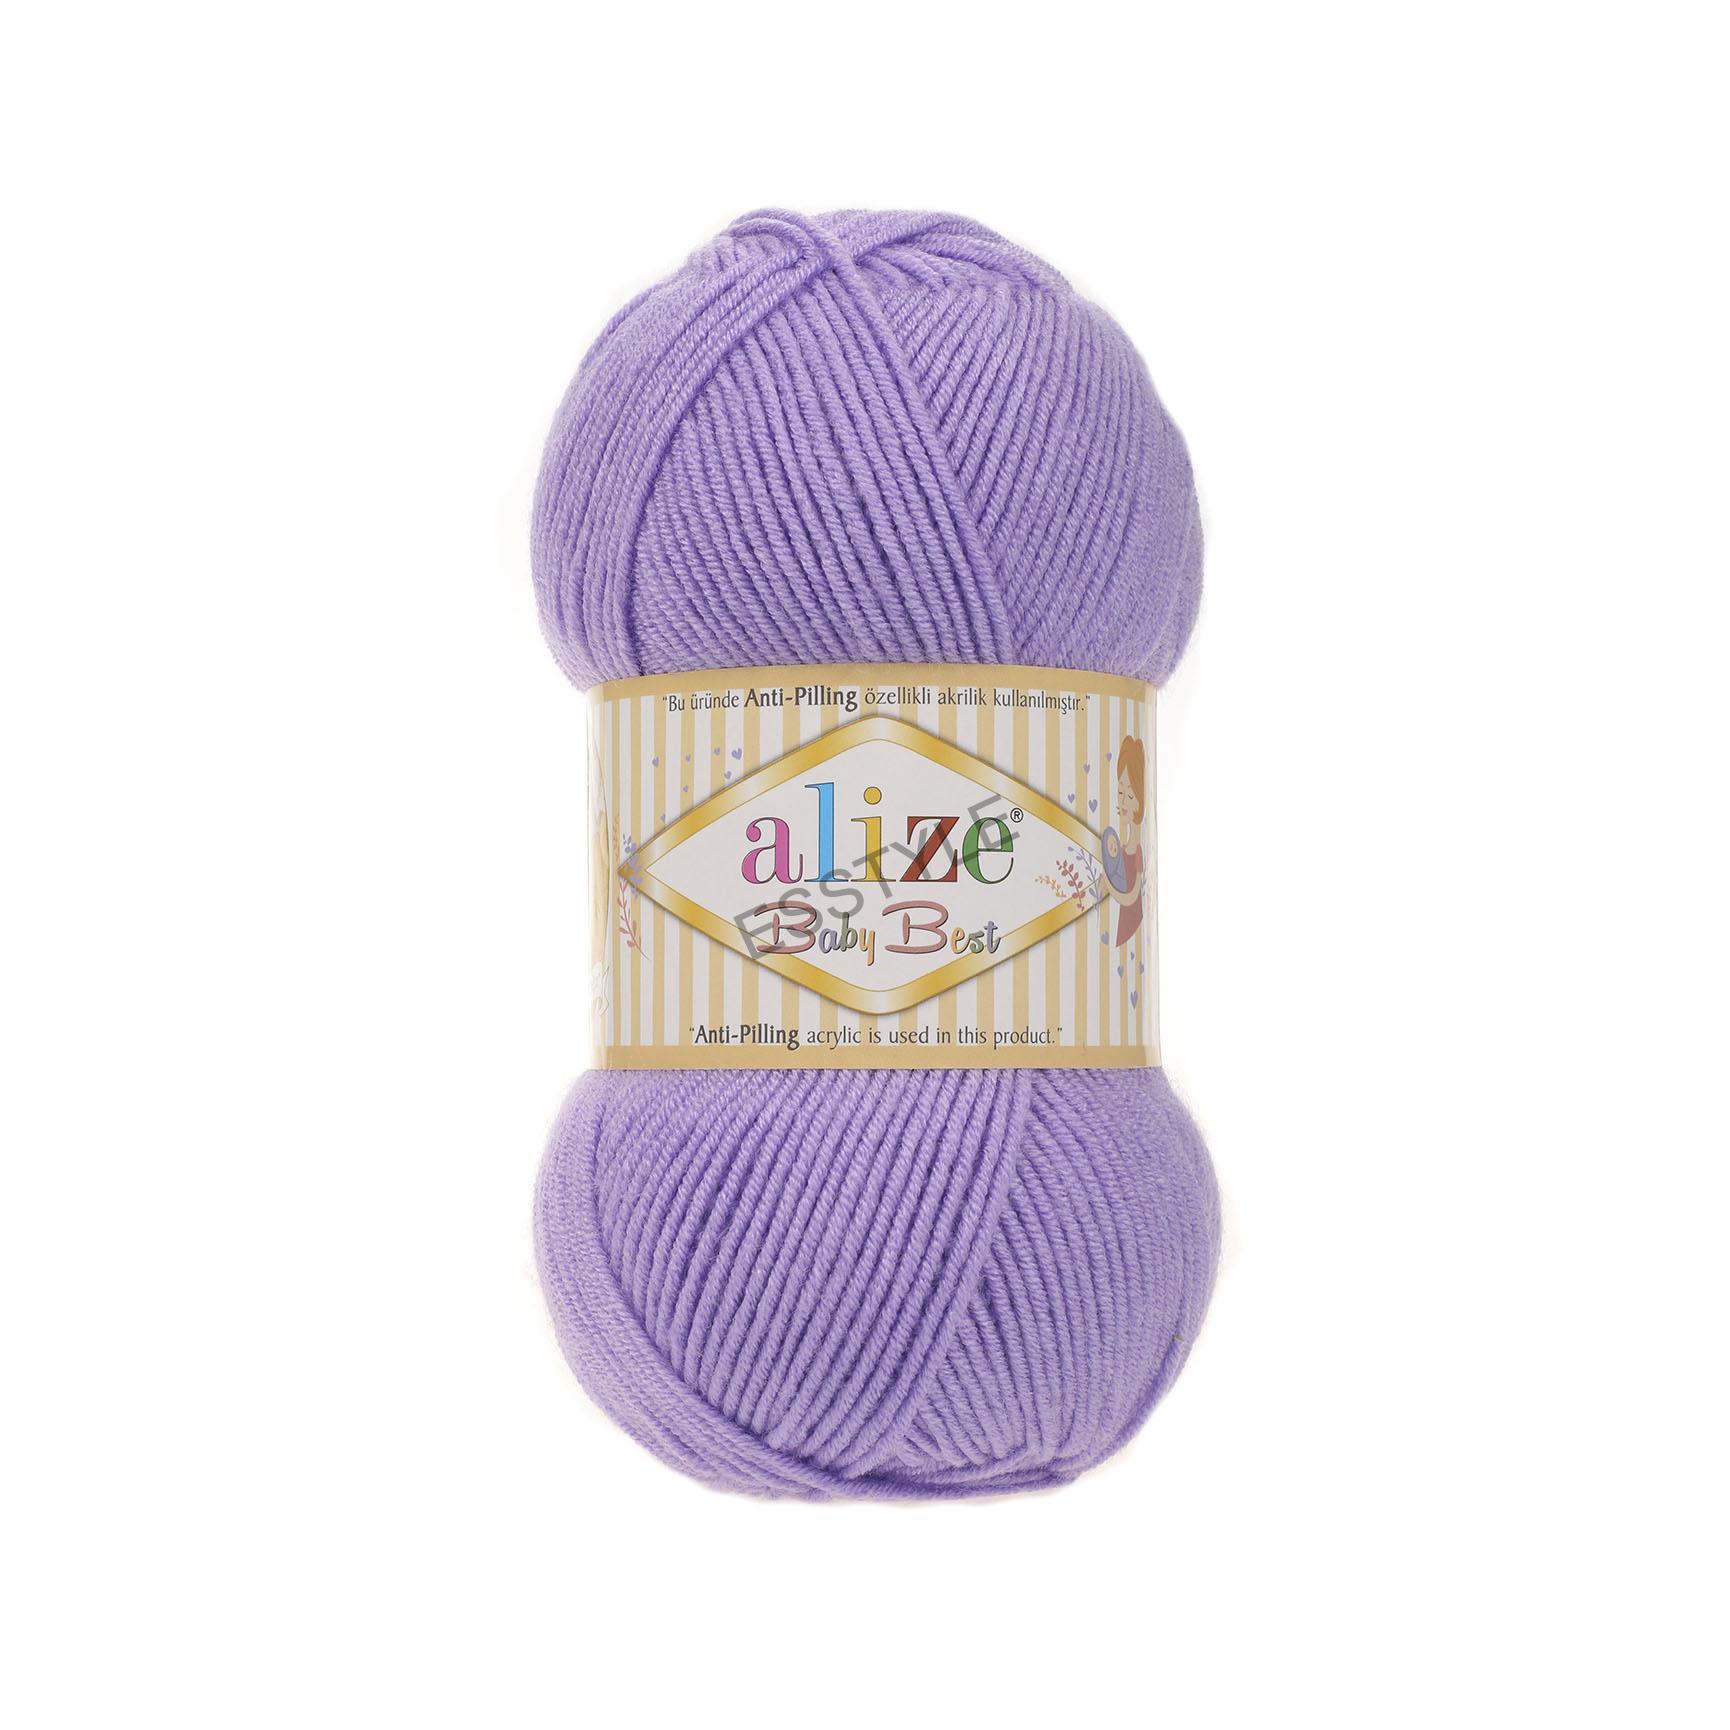 5bc825cf3 Priadza Alize - Baby best 100g - Anti-pilling - fialová - č. 43